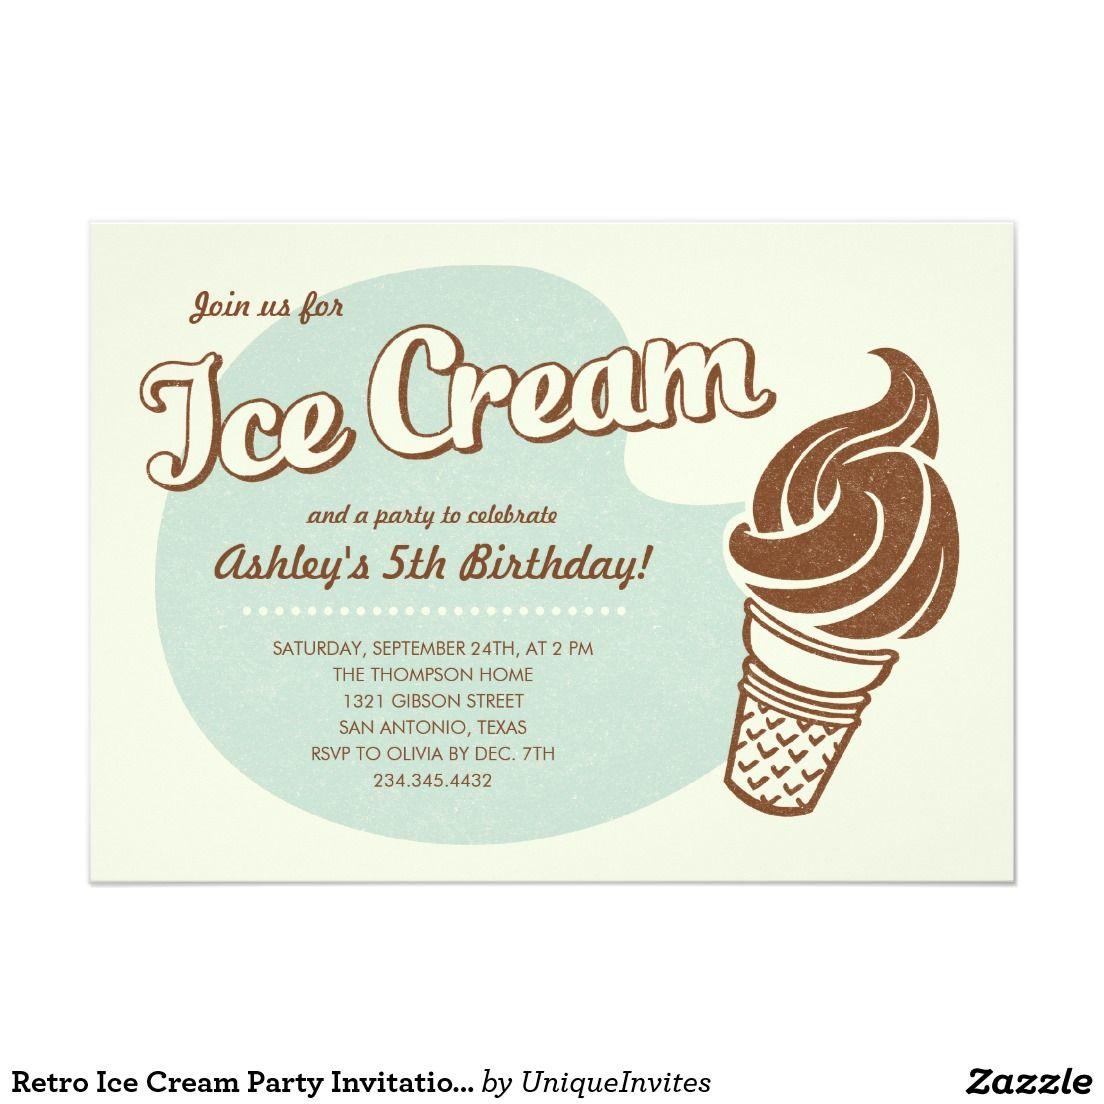 Retro Ice Cream Party Invitations   Party invitations